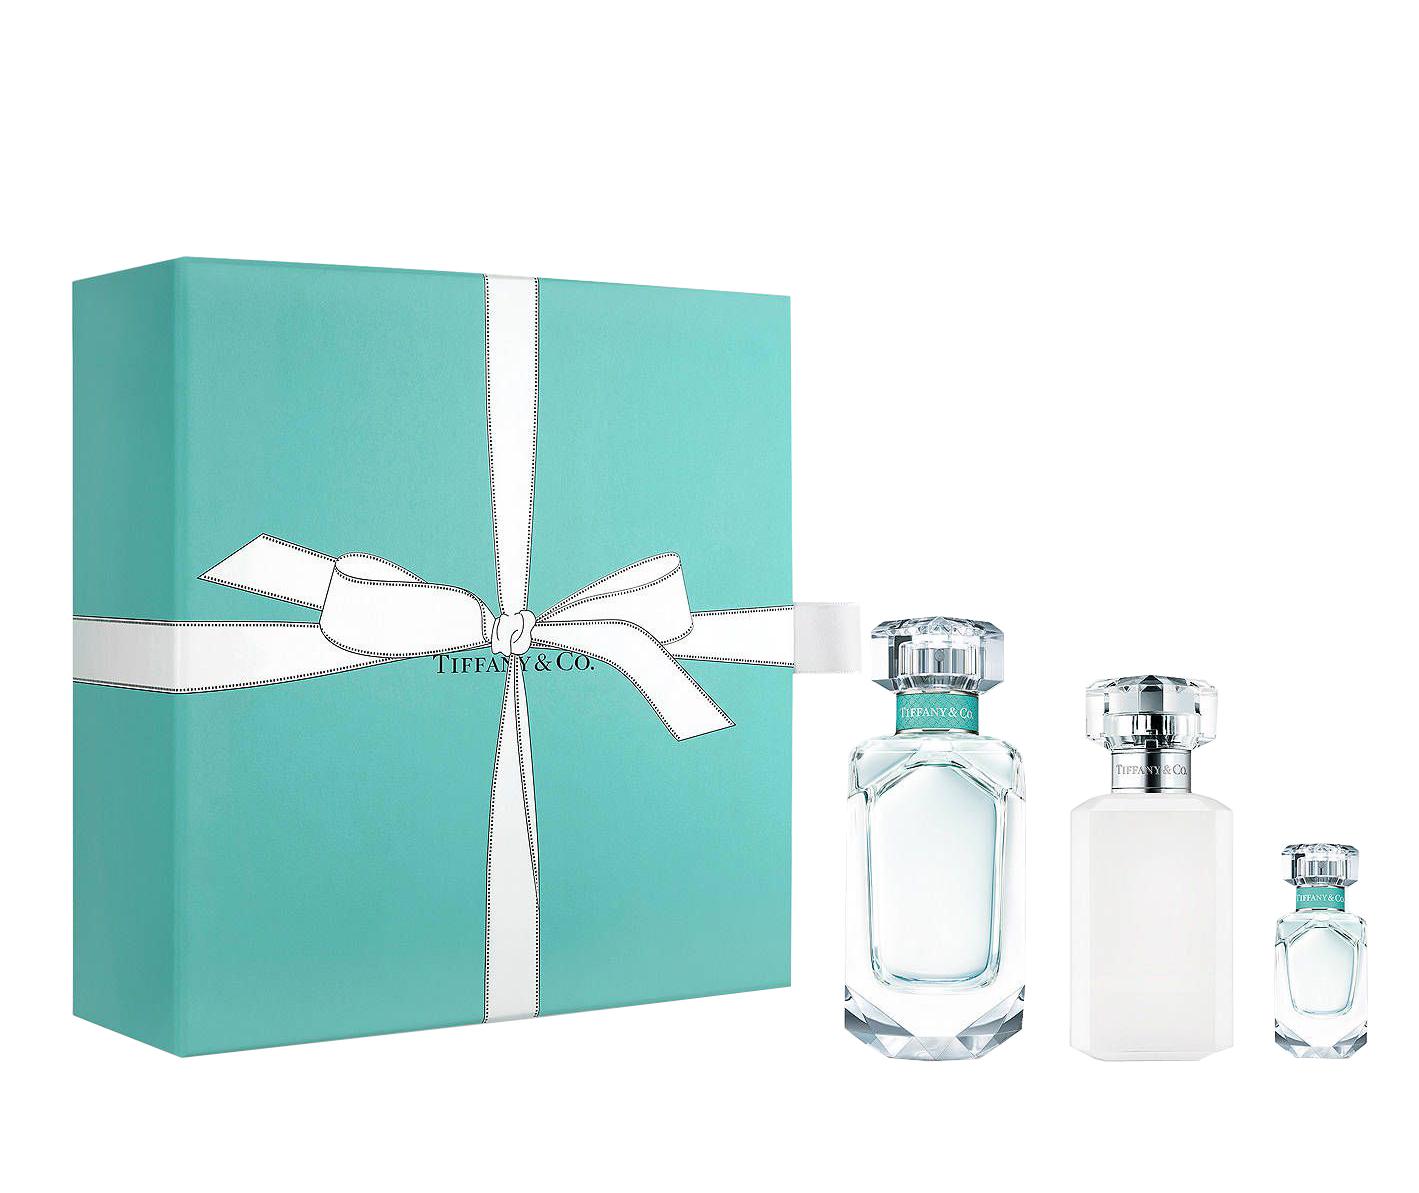 Tiffany & Co. - Signature EDP 75 ml + Body Lotion 100 ml + Mini EDP 5 ml - Xmas Giftset